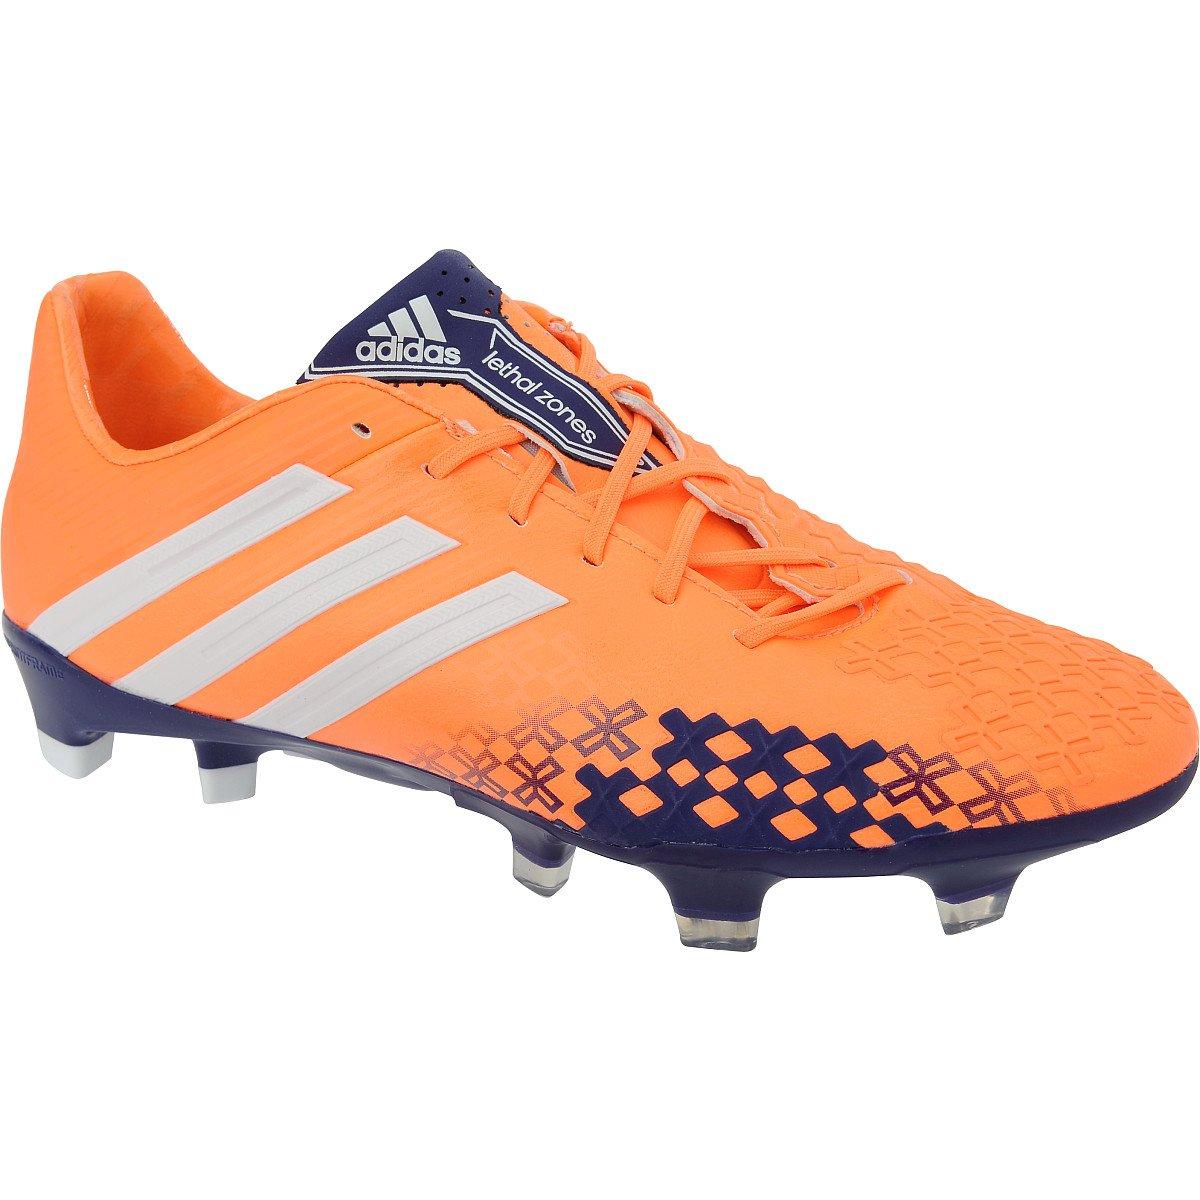 9ba7735b8a510 Amazon.com   adidas Predator LZ TRX FG Soccer Shoes Orange/Blue Size ...